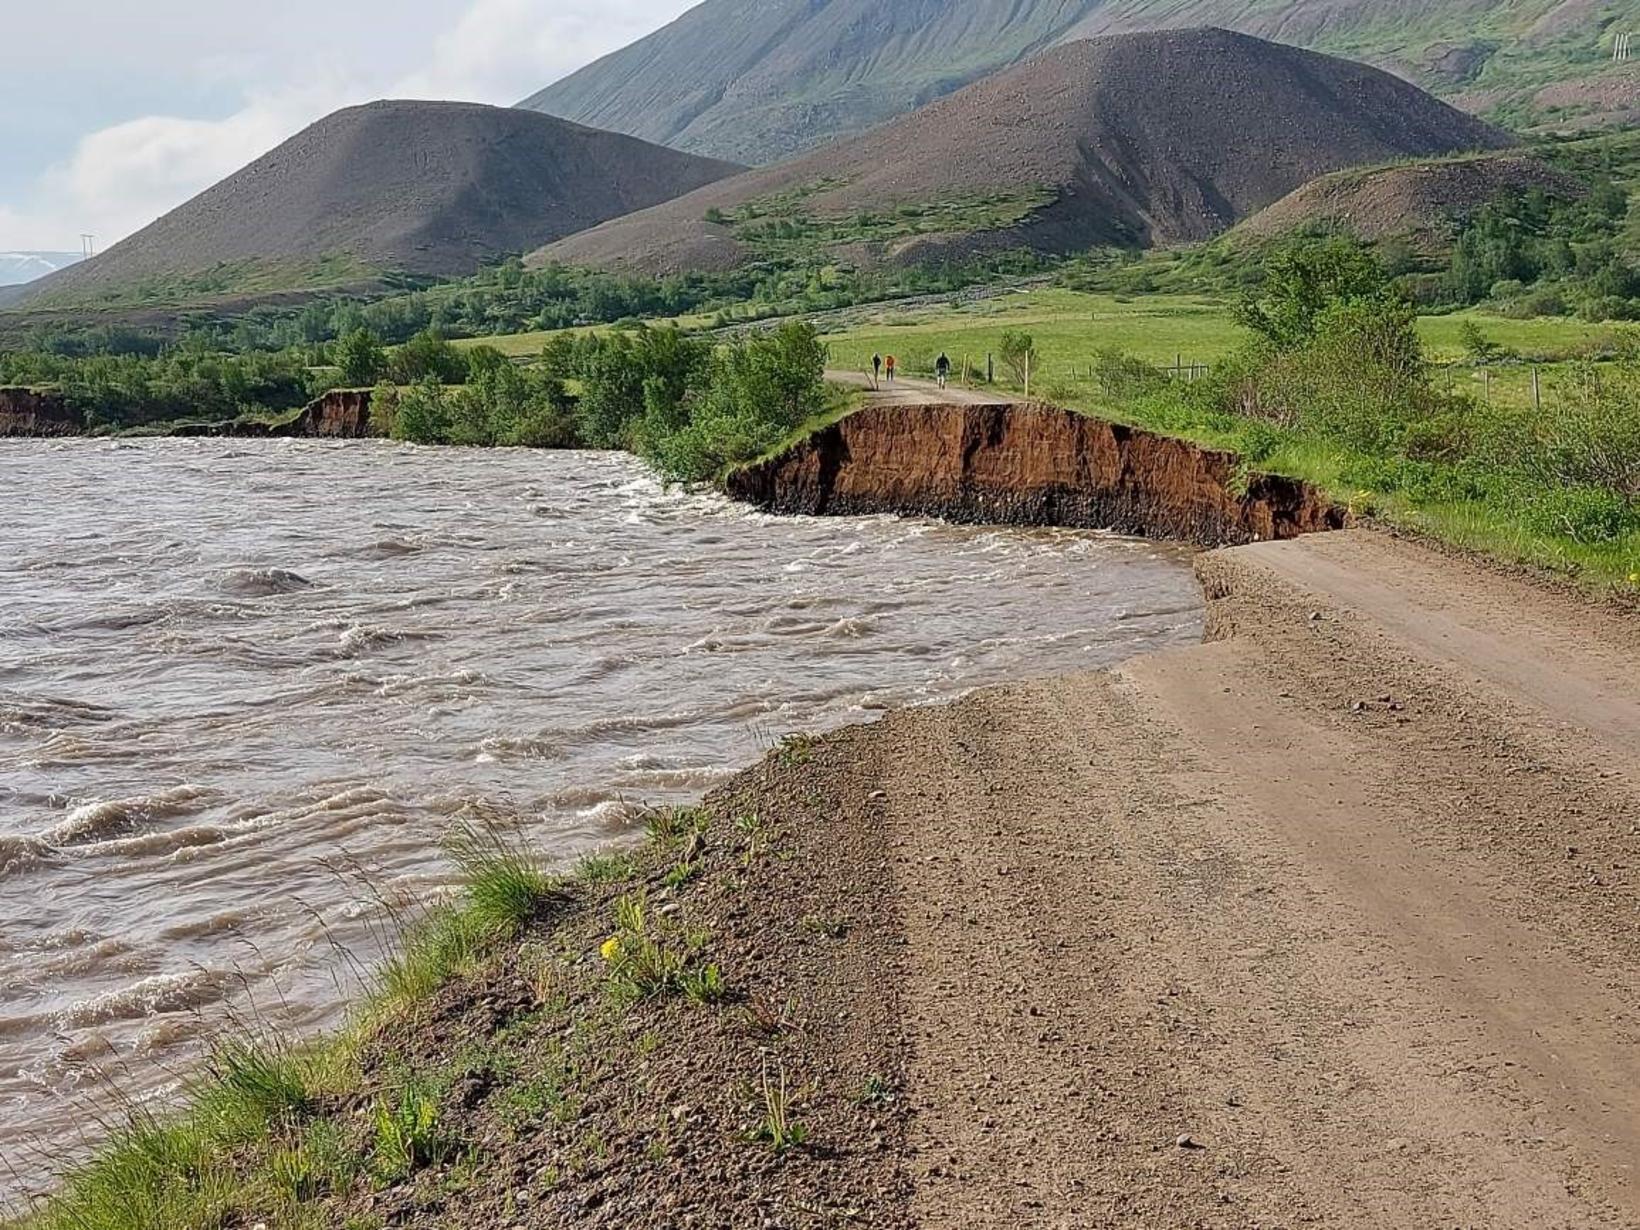 The road along Fnjóská river is damaged by flood.